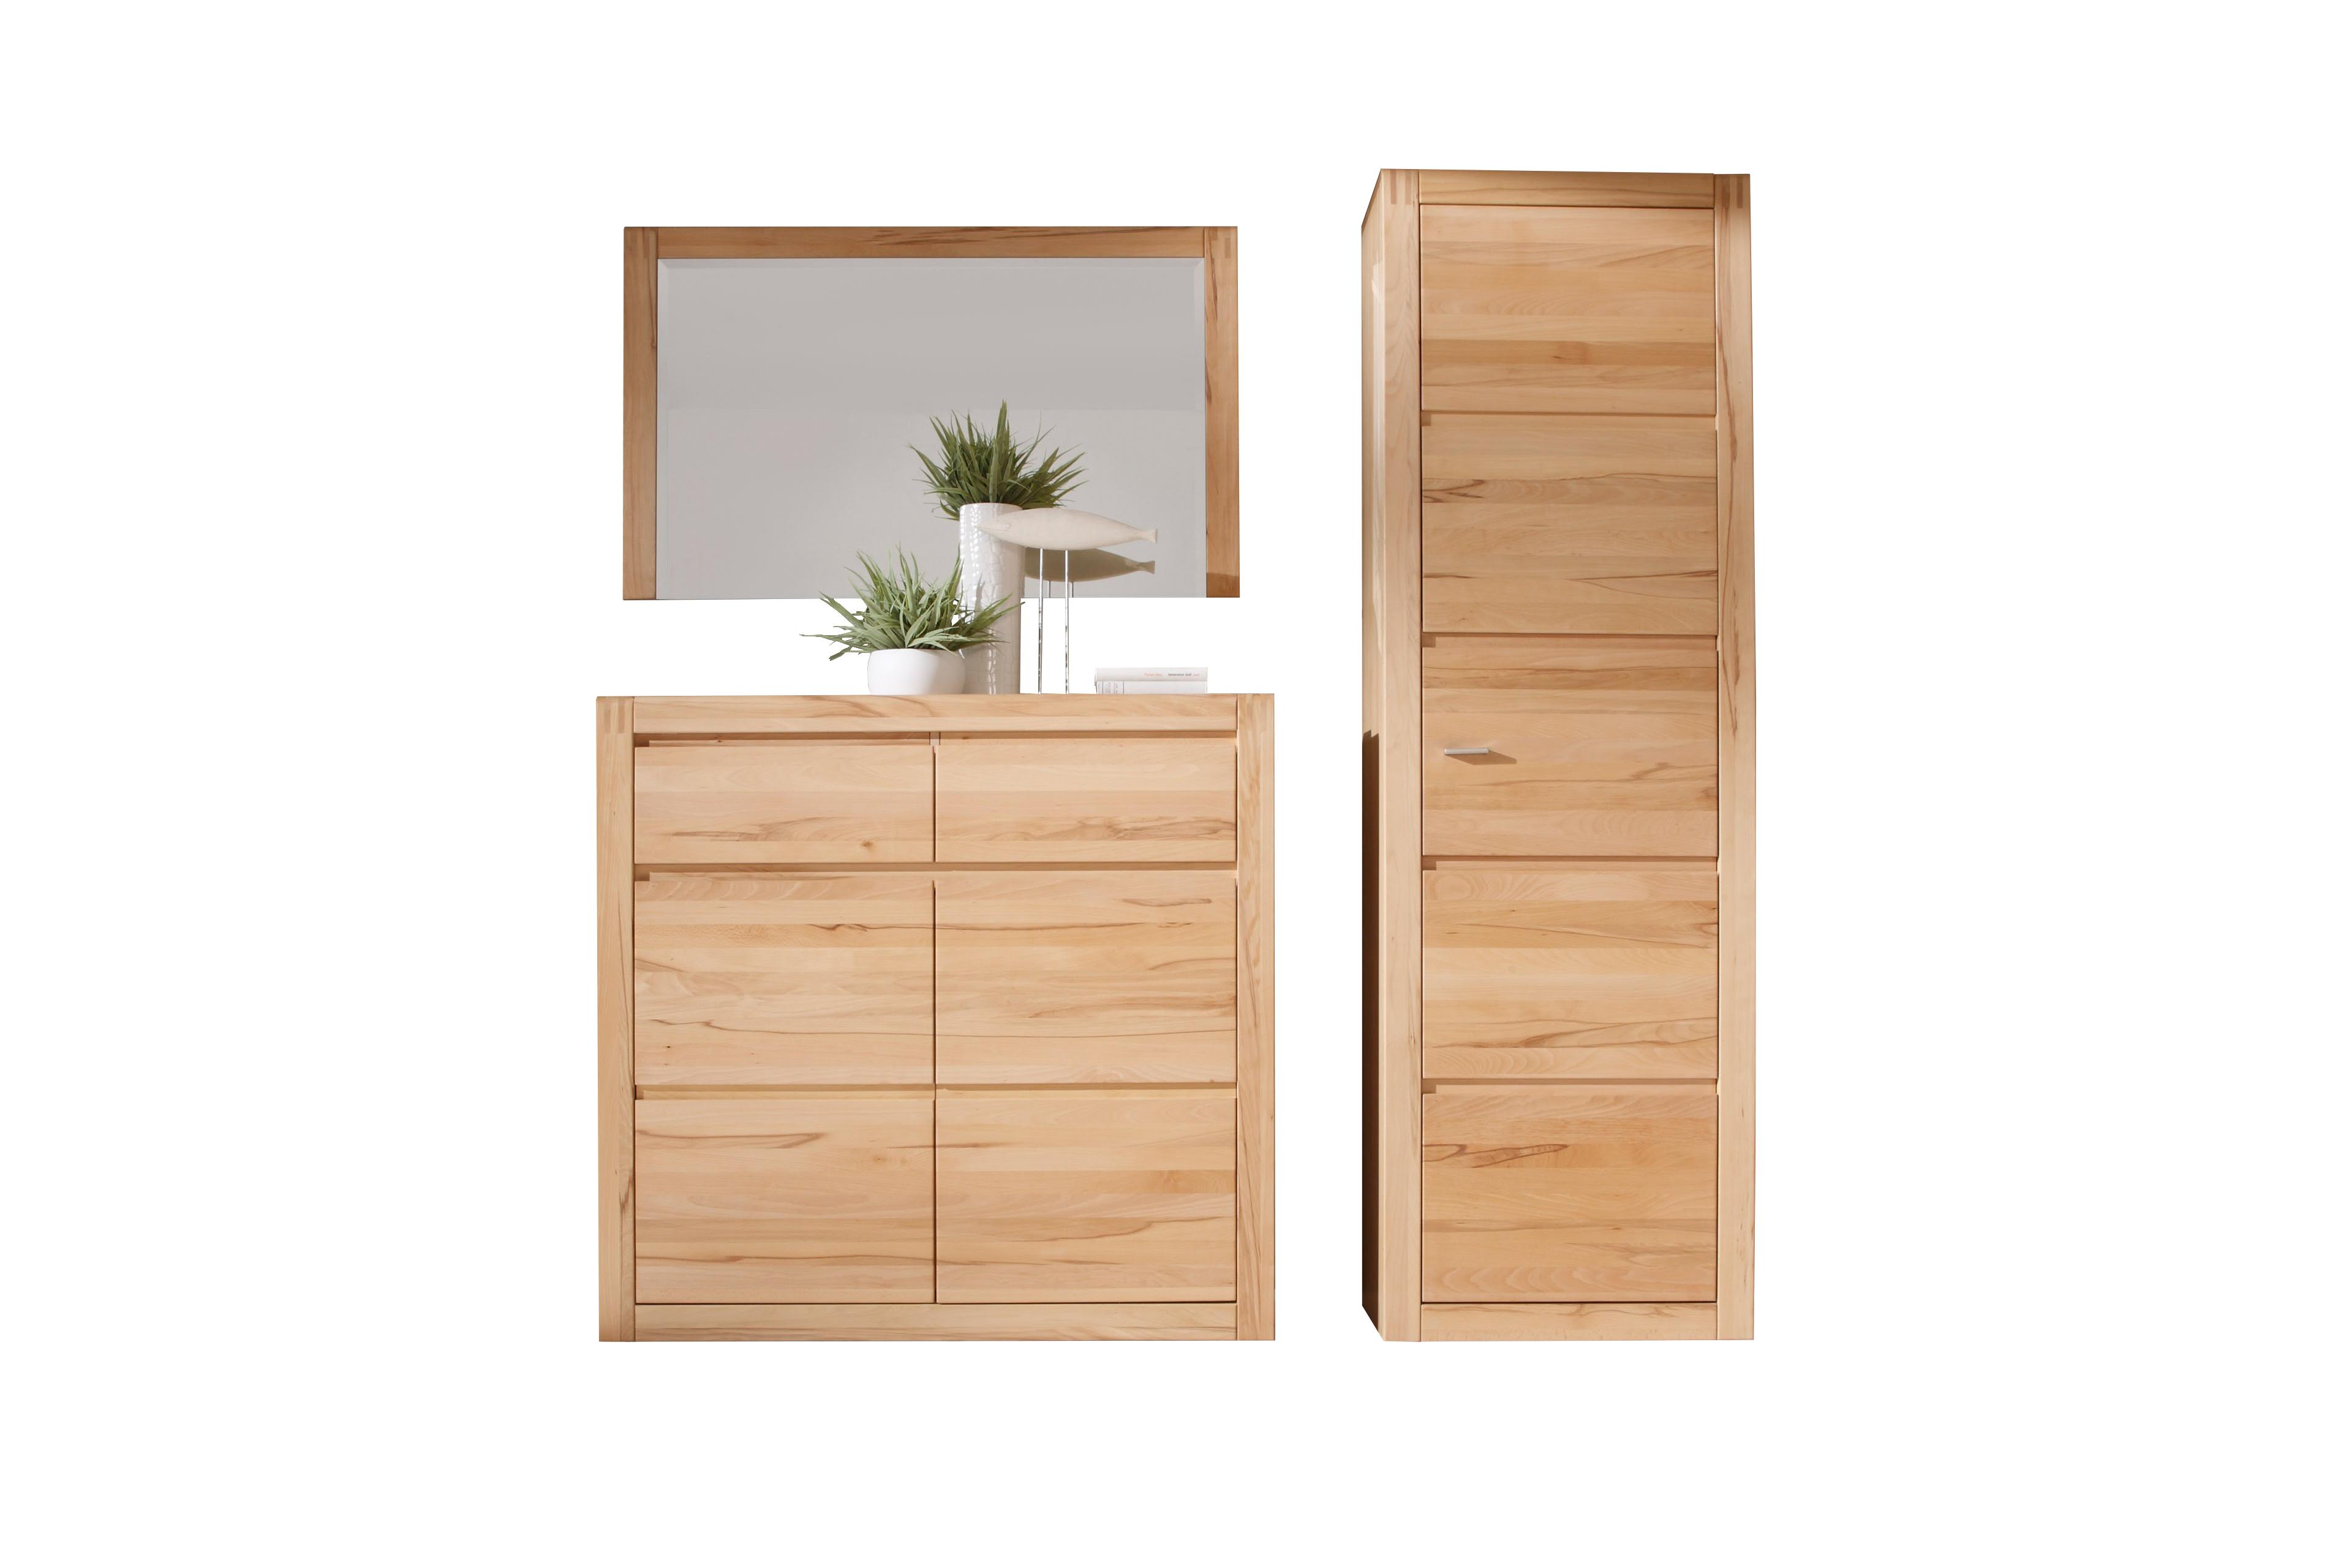 garderobe vivien kernbuchenholz aus der kollektion letz. Black Bedroom Furniture Sets. Home Design Ideas